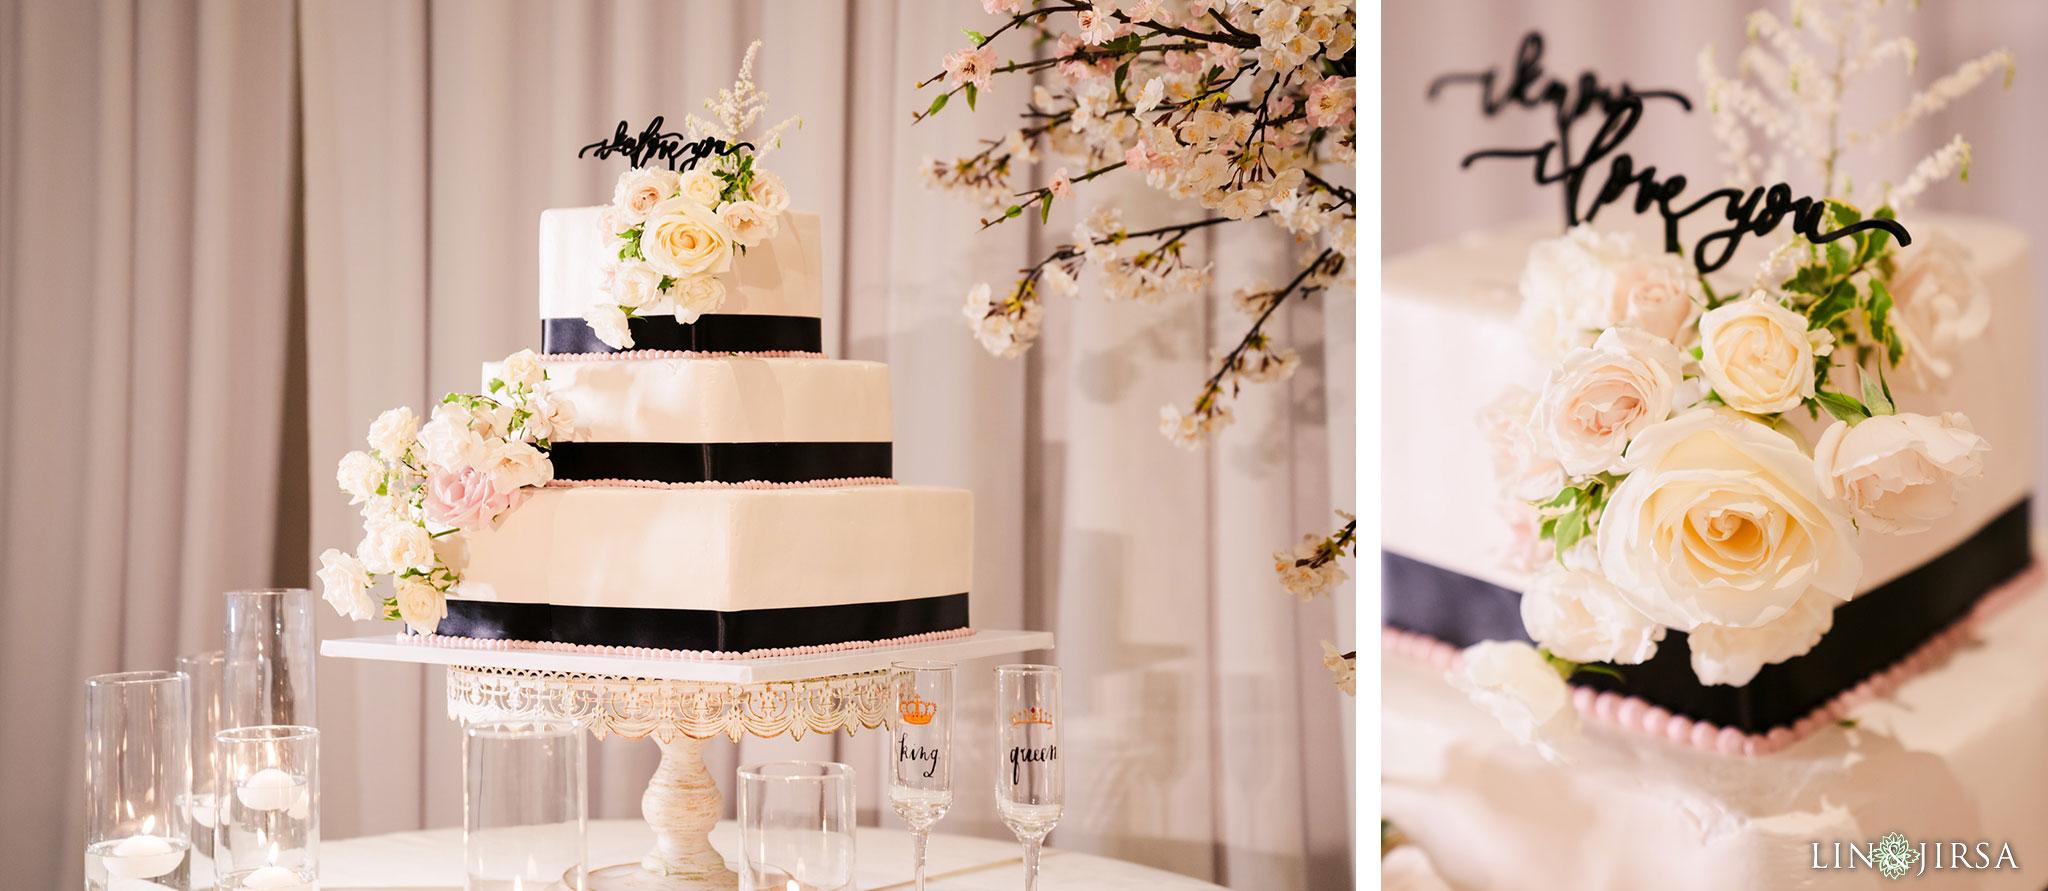 15 venue by three petals huntington beach wedding photography